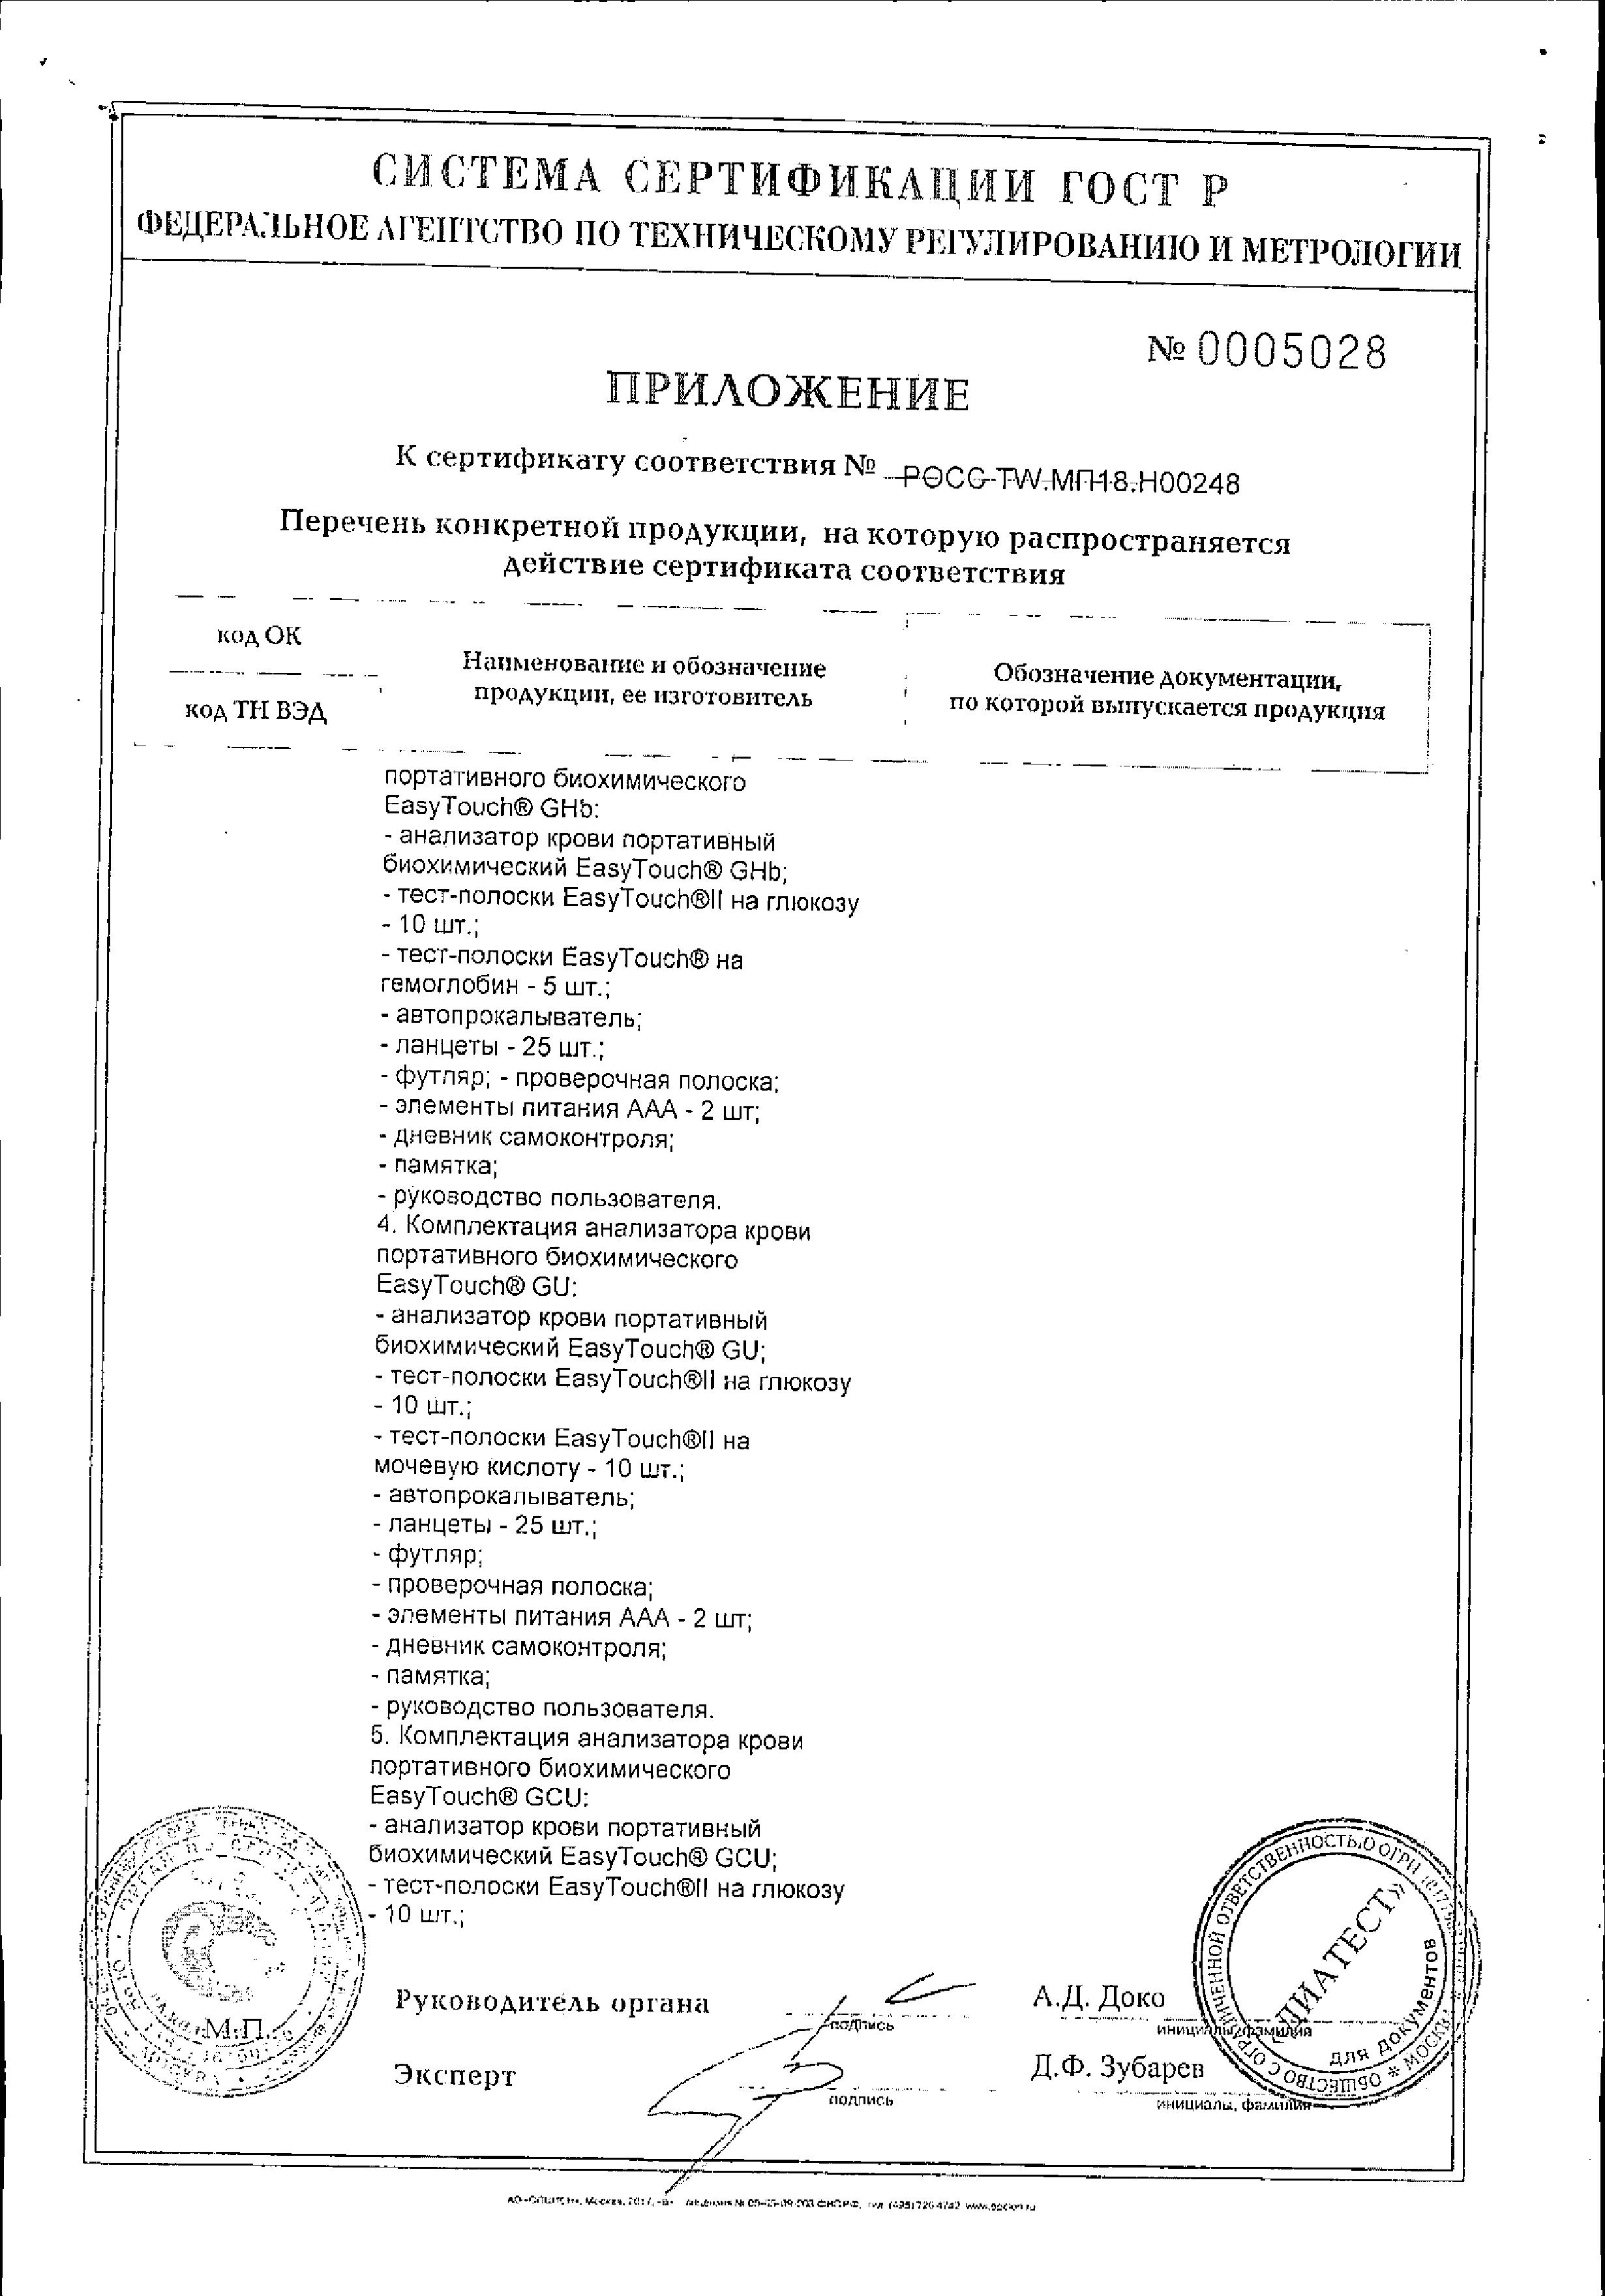 EasyTouch GCHB ET-321 анализатор крови Глюкоза Холестерин Гемоглобин сертификат